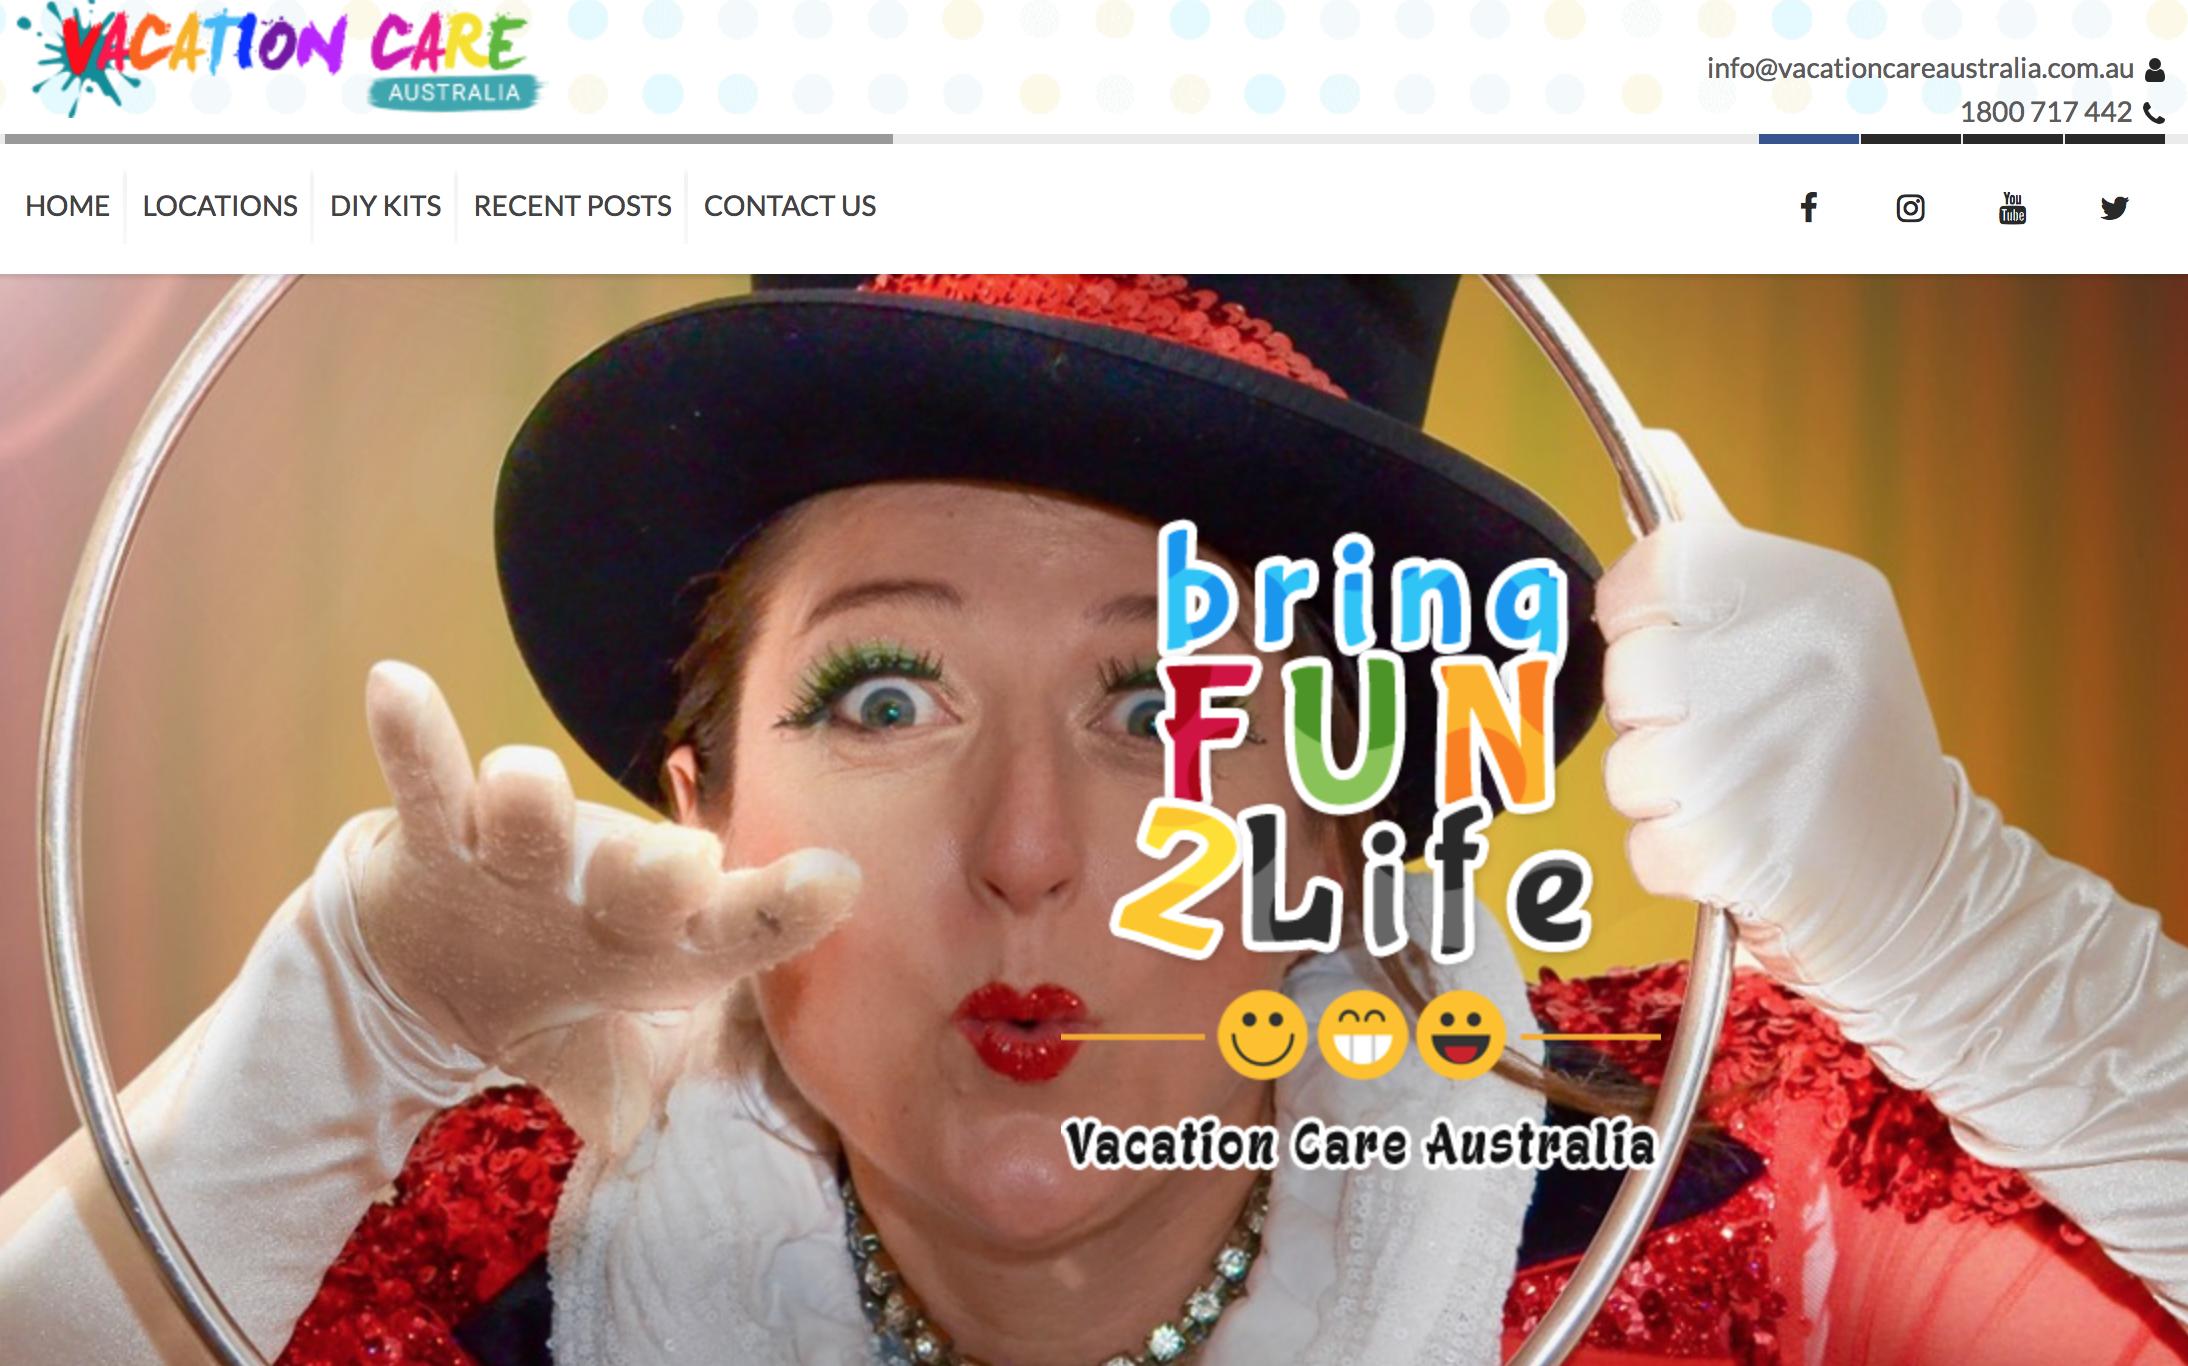 website design sydney graphic designers wordpress magento weebly shopify